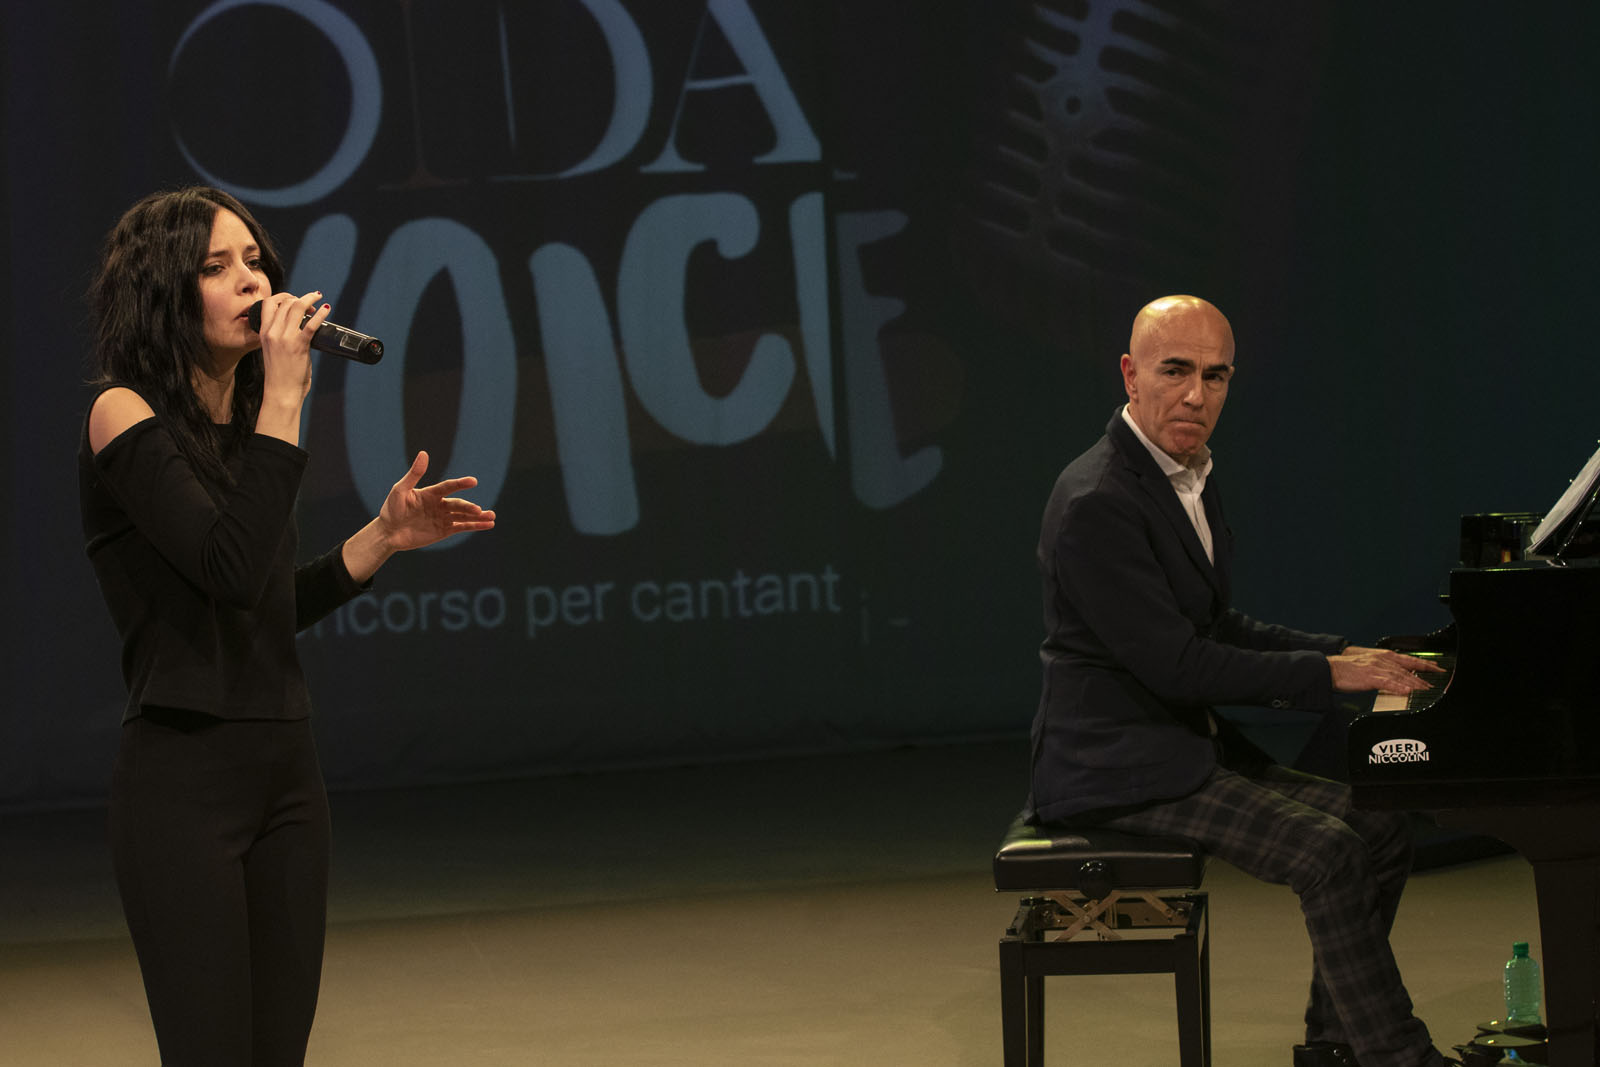 Tania Giommoni a Oida Voice